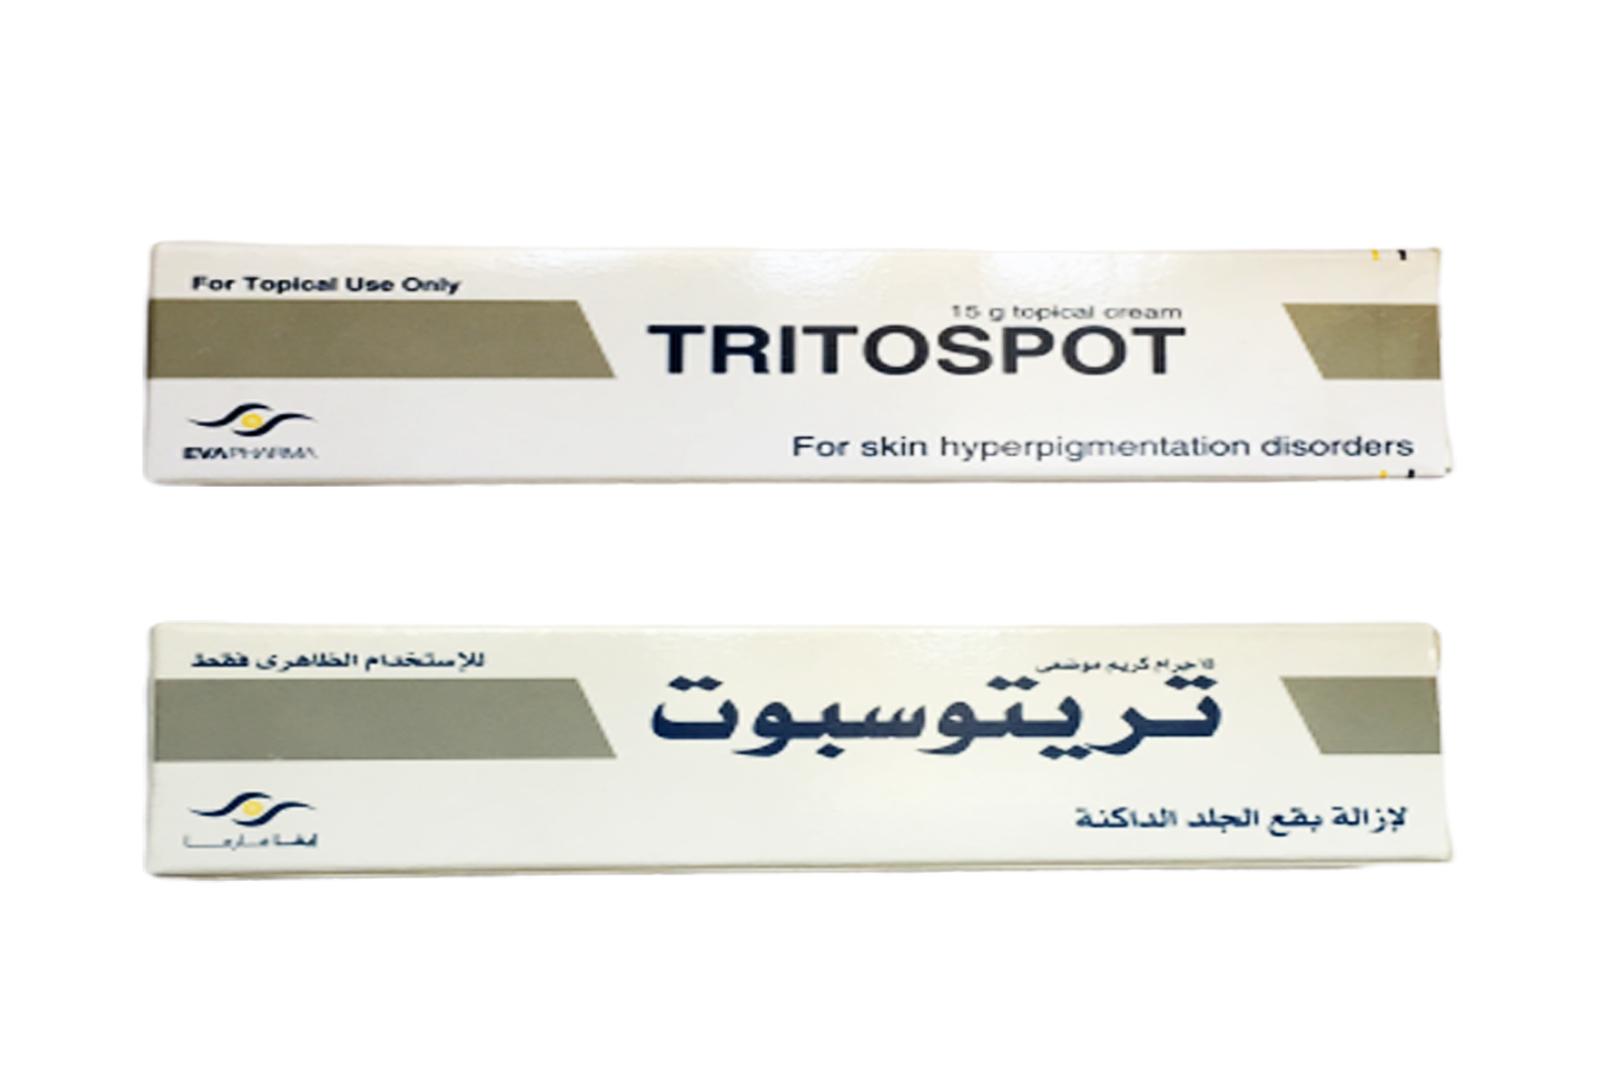 3 PACKS TRITOSPOT CREAM WHITENING Cream for Skin Hyperpigmentation Problems